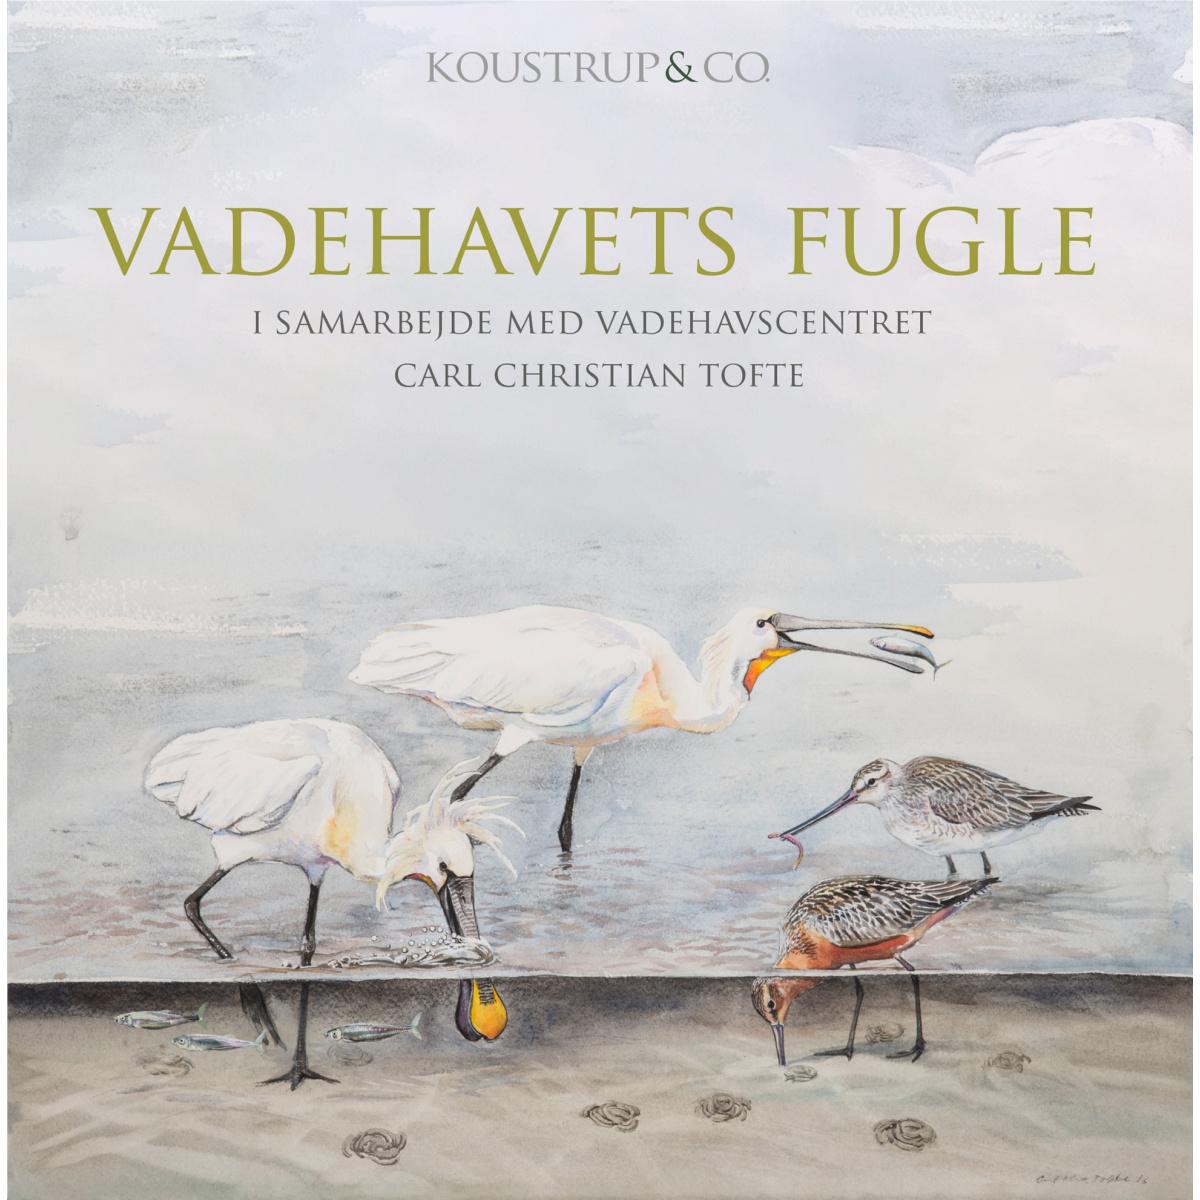 Koustrup & Co. kortmappe - vadehavets fugle